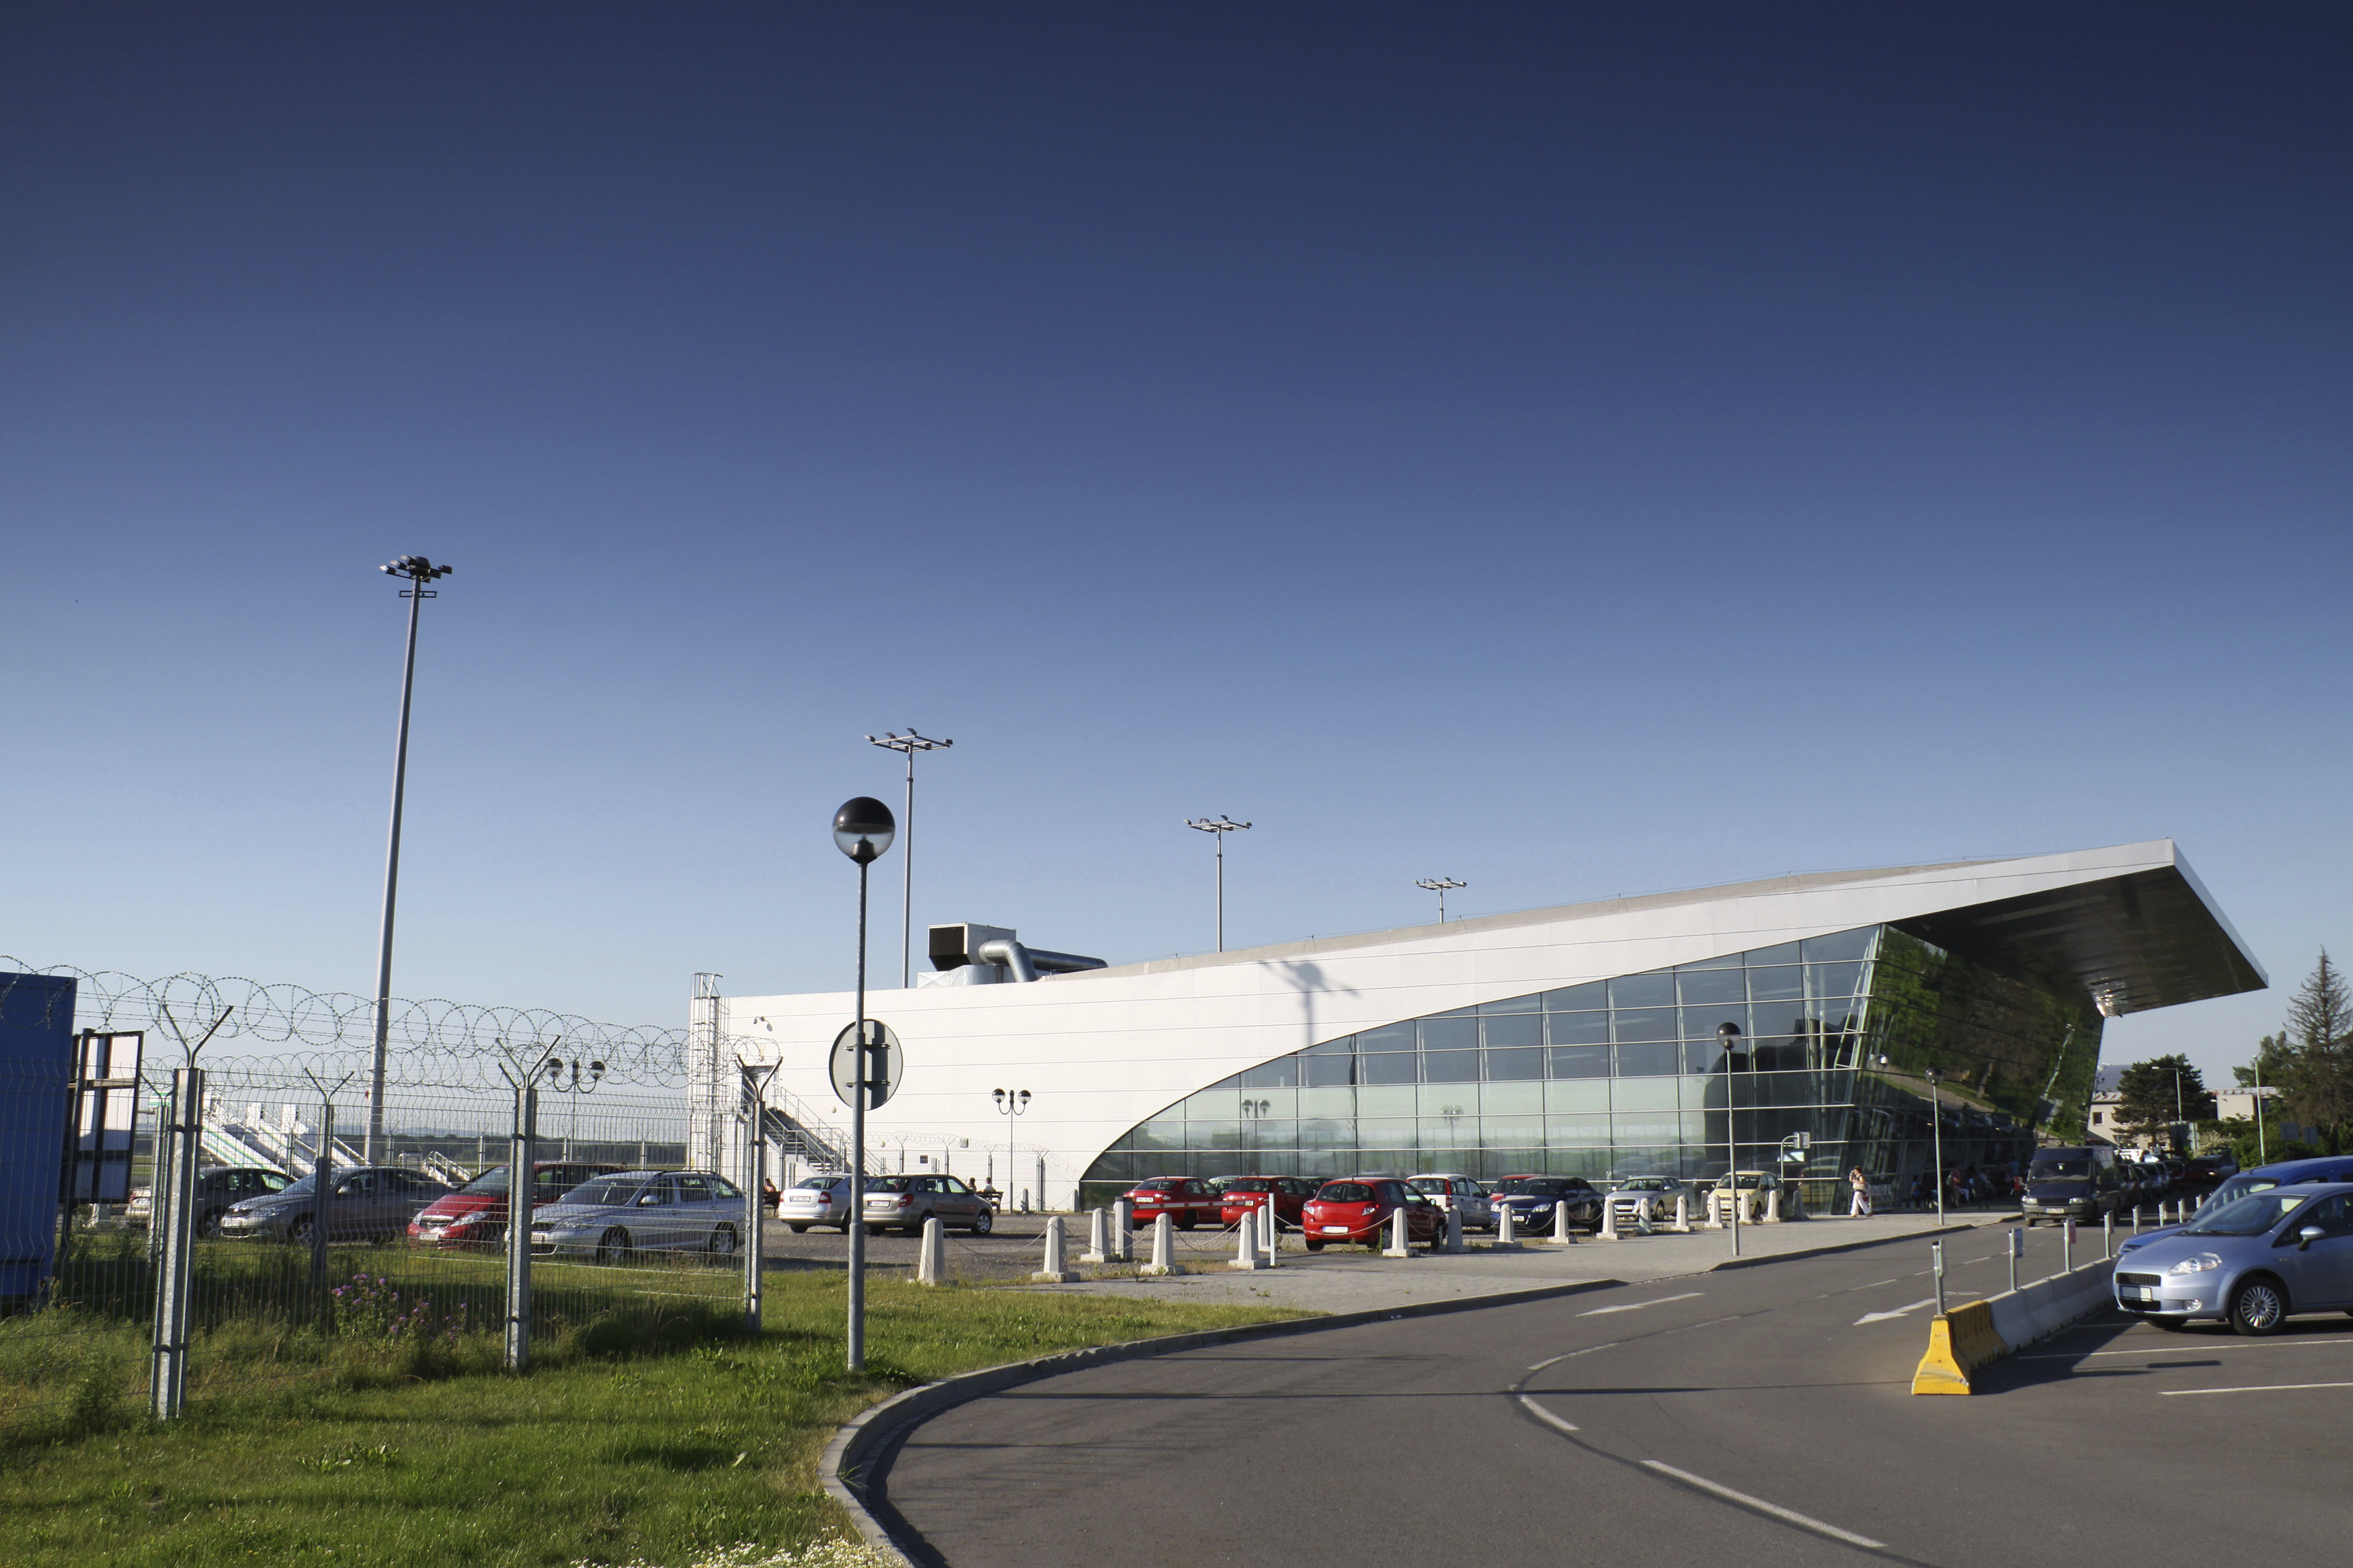 Leos Janacek Airport